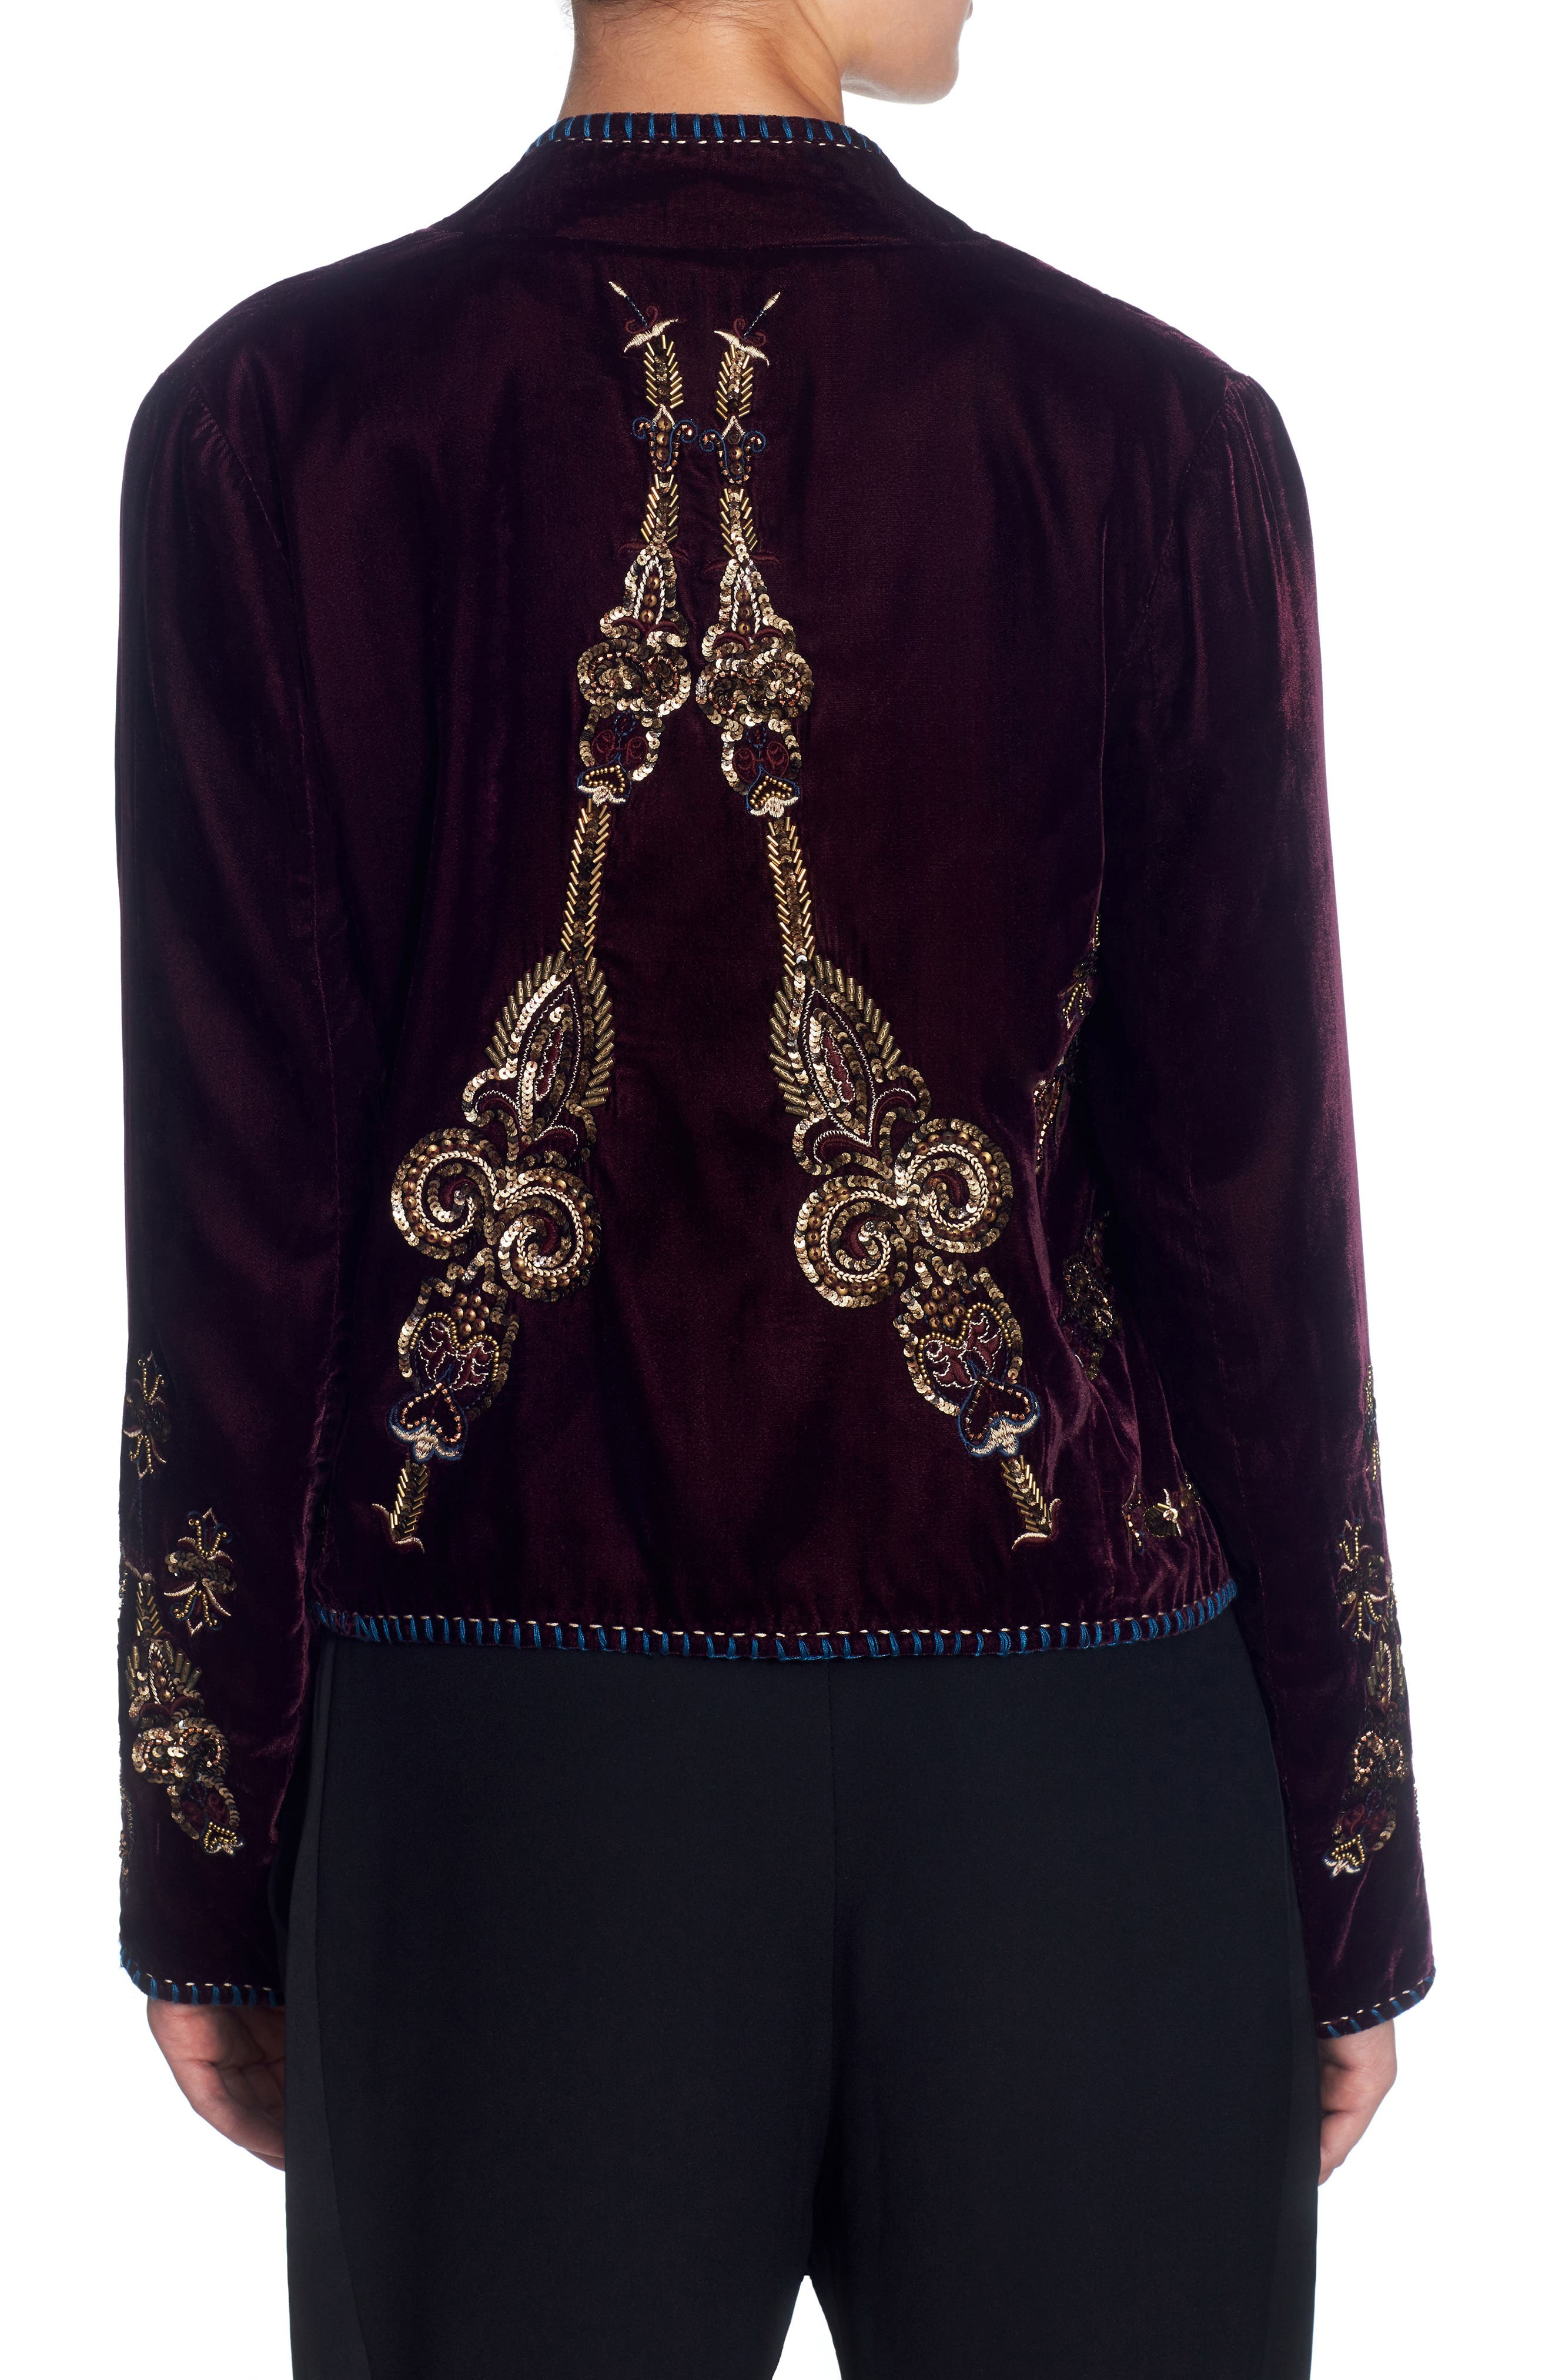 Winstead Embellished Velvet Jacket,                             Alternate thumbnail 2, color,                             Grape Wine